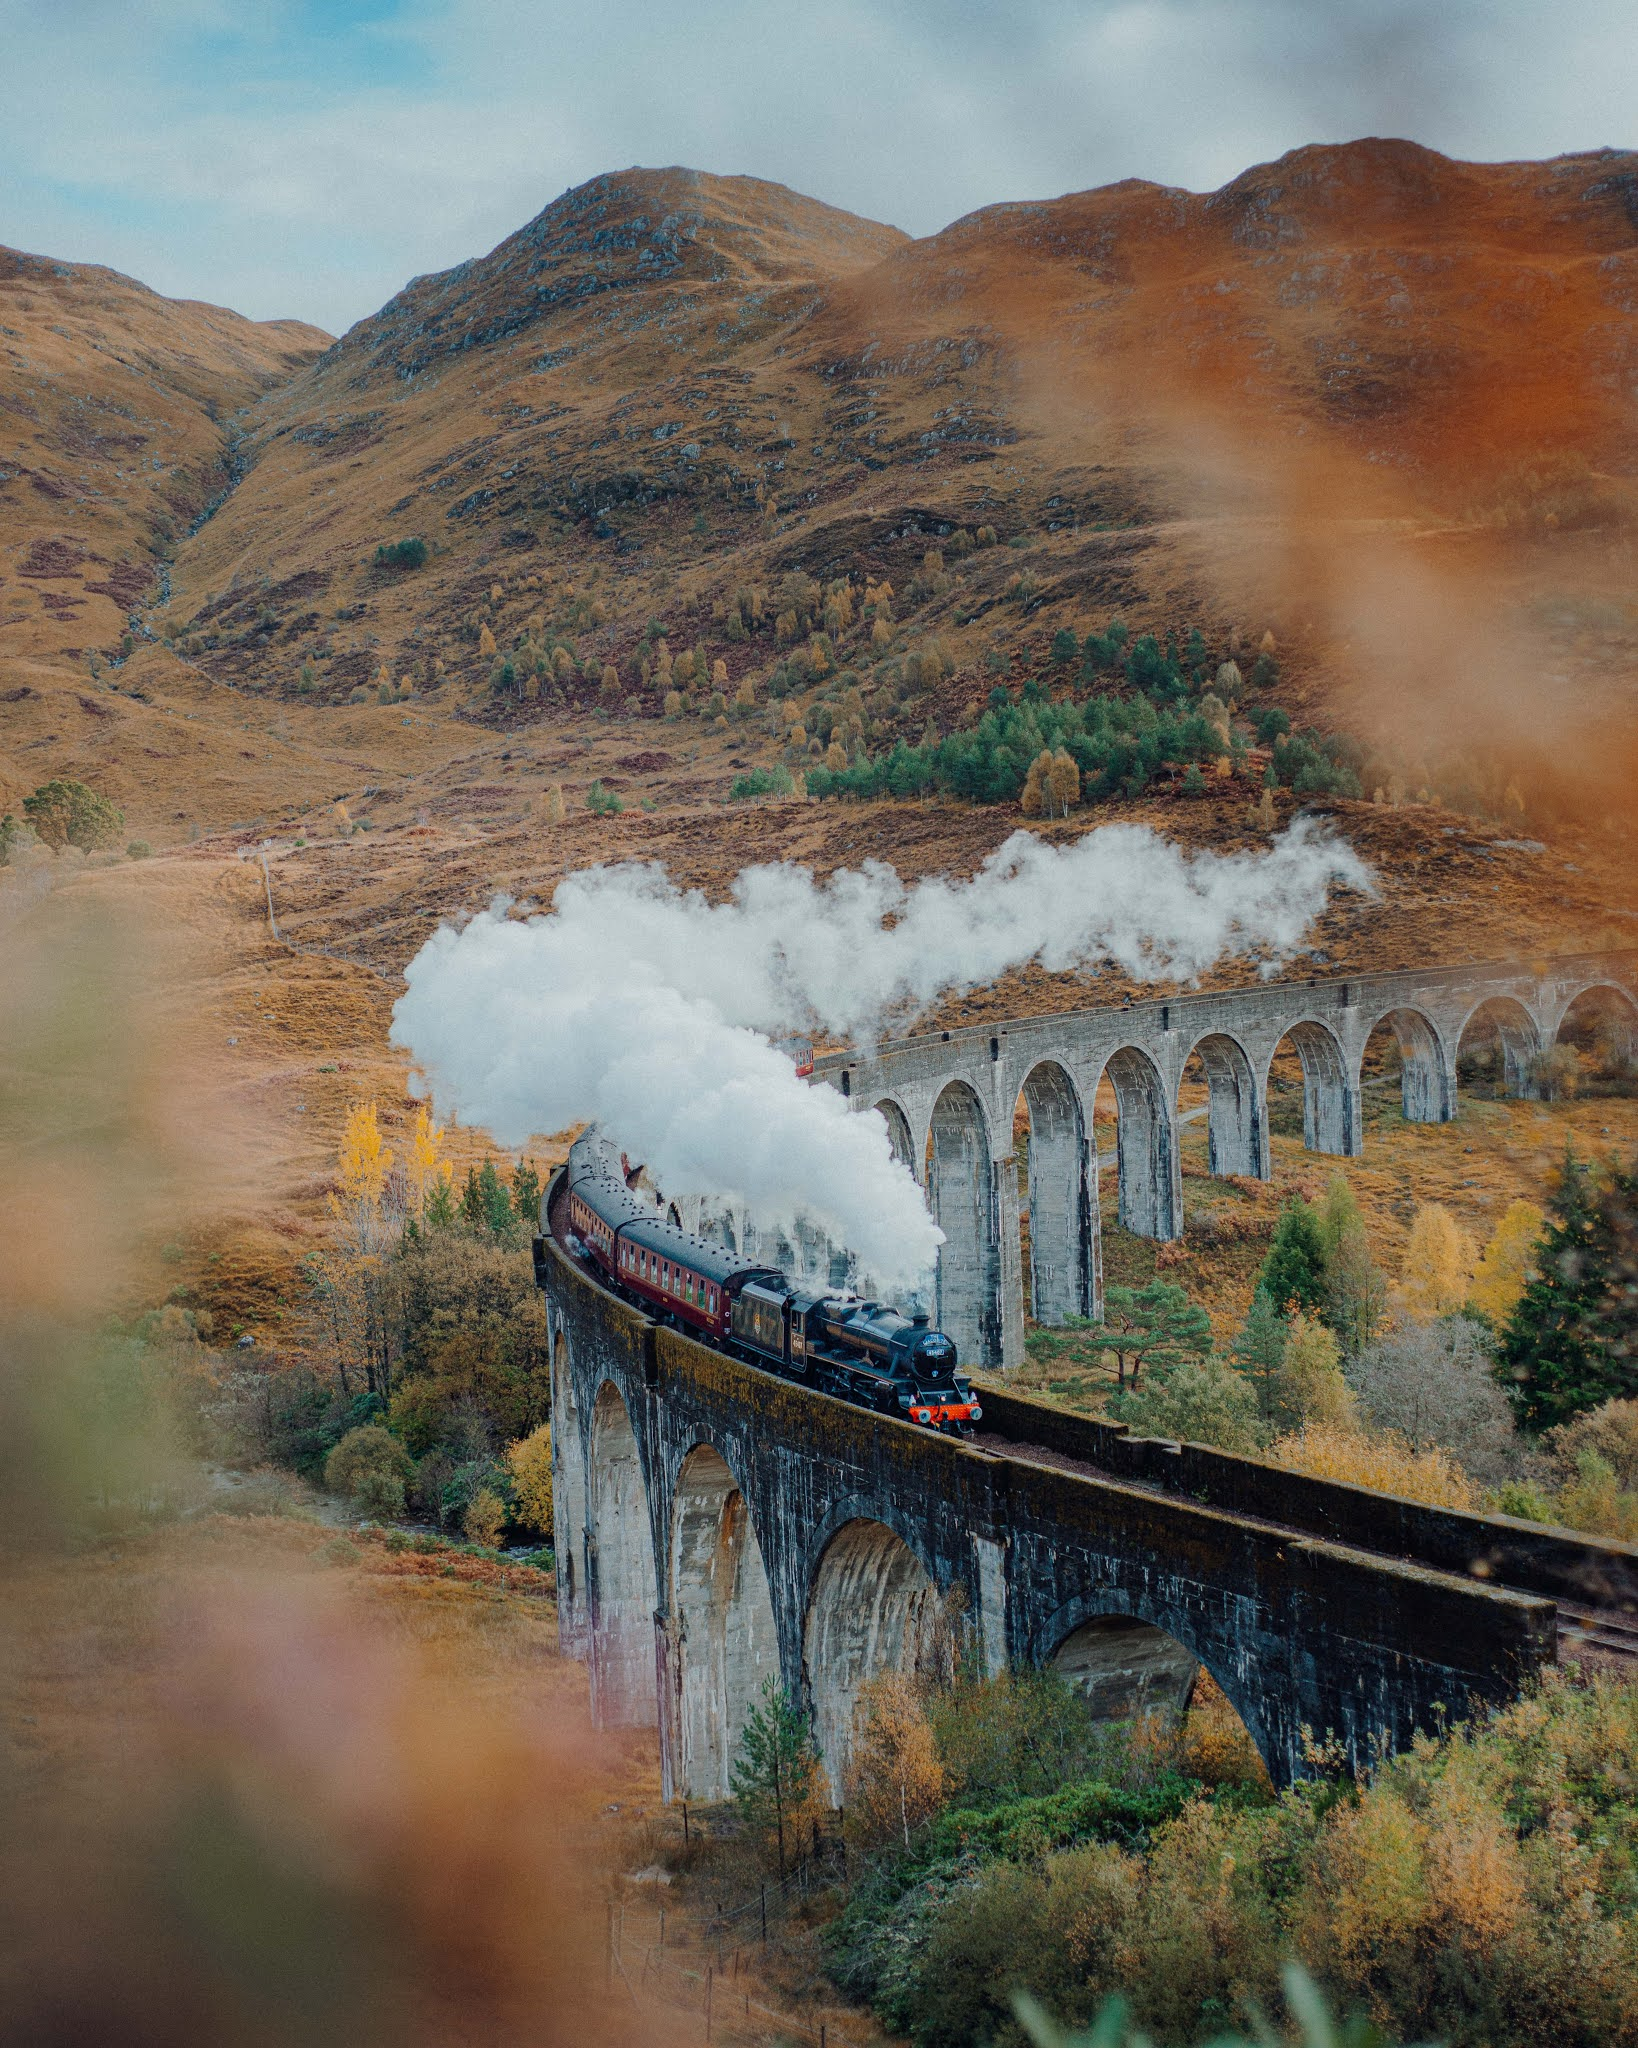 How to Take Iconic Glenfinnan Viaduct Photos - Train Photo Spot